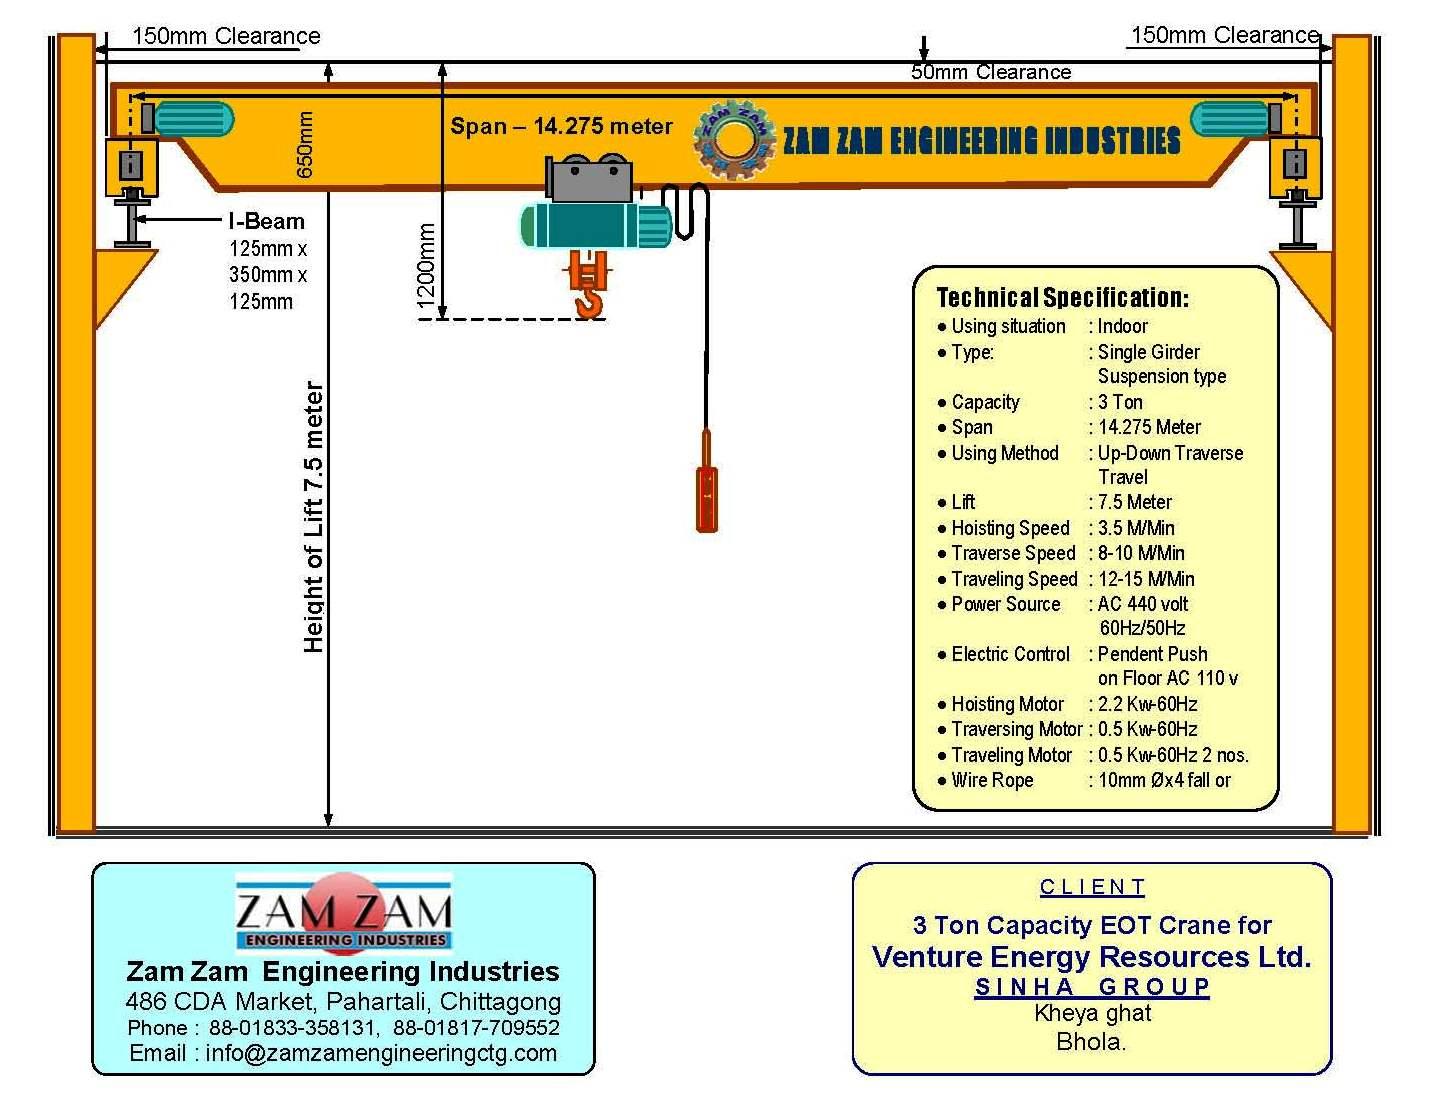 EOT Crane Drawing 3Ton SINHA Venture Energy.2014?resize\\\\\\\=665%2C510 crane hi 4 wiring diagram revtech 100 diagram, badlands badlands illuminator wiring diagram at mr168.co